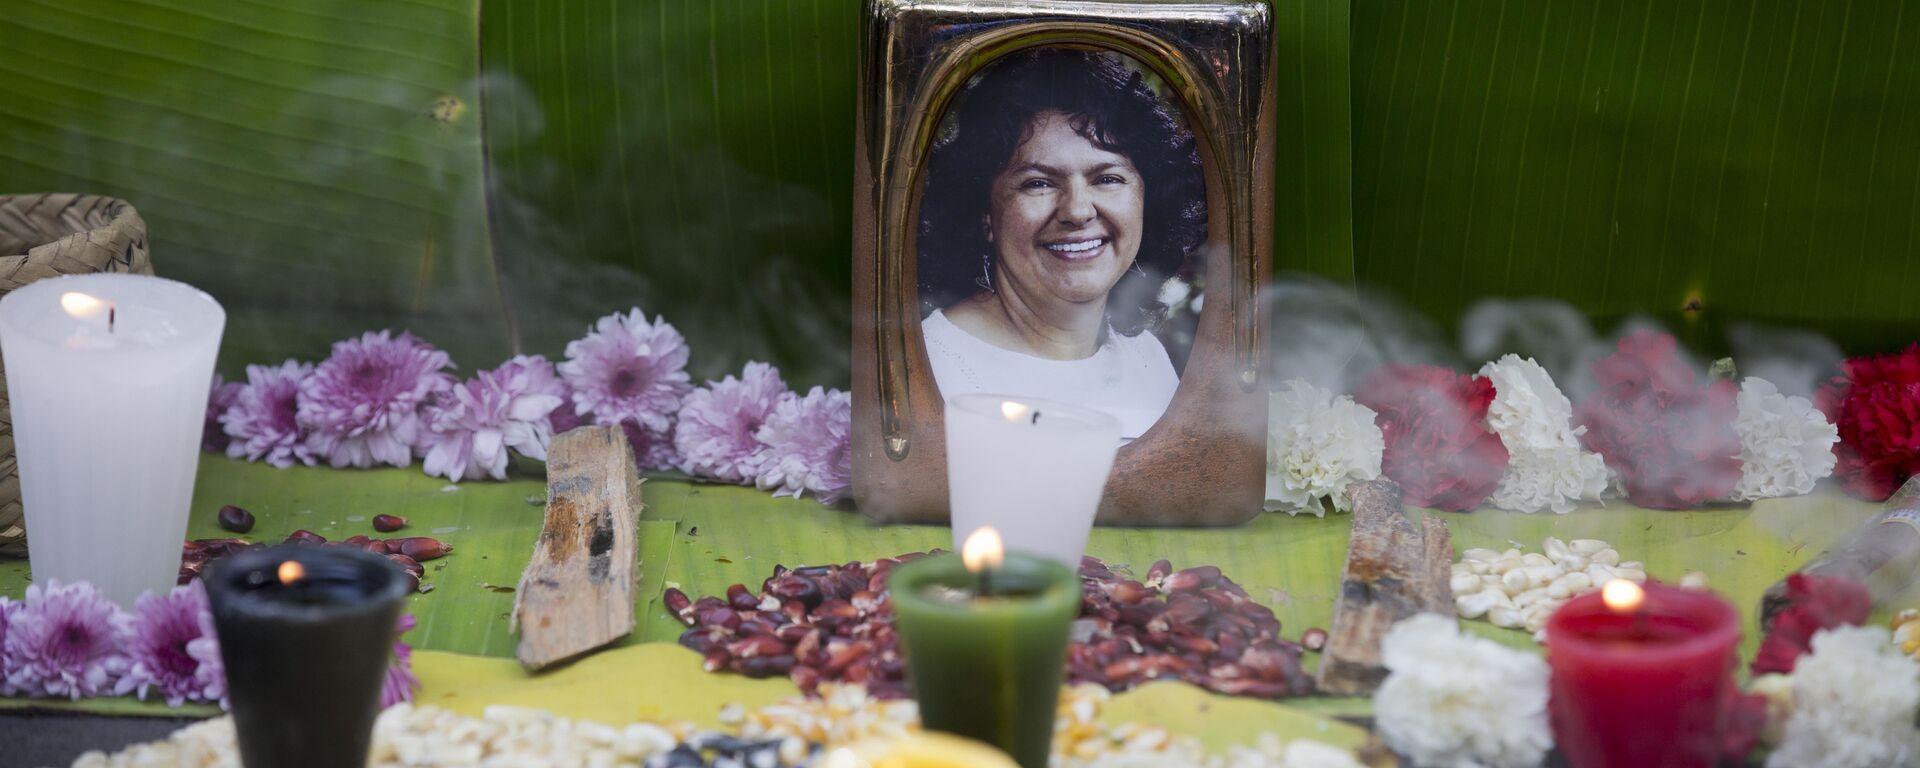 Foto de Berta Cáceres en un altar levantado en su memoria - Sputnik Mundo, 1920, 28.09.2020